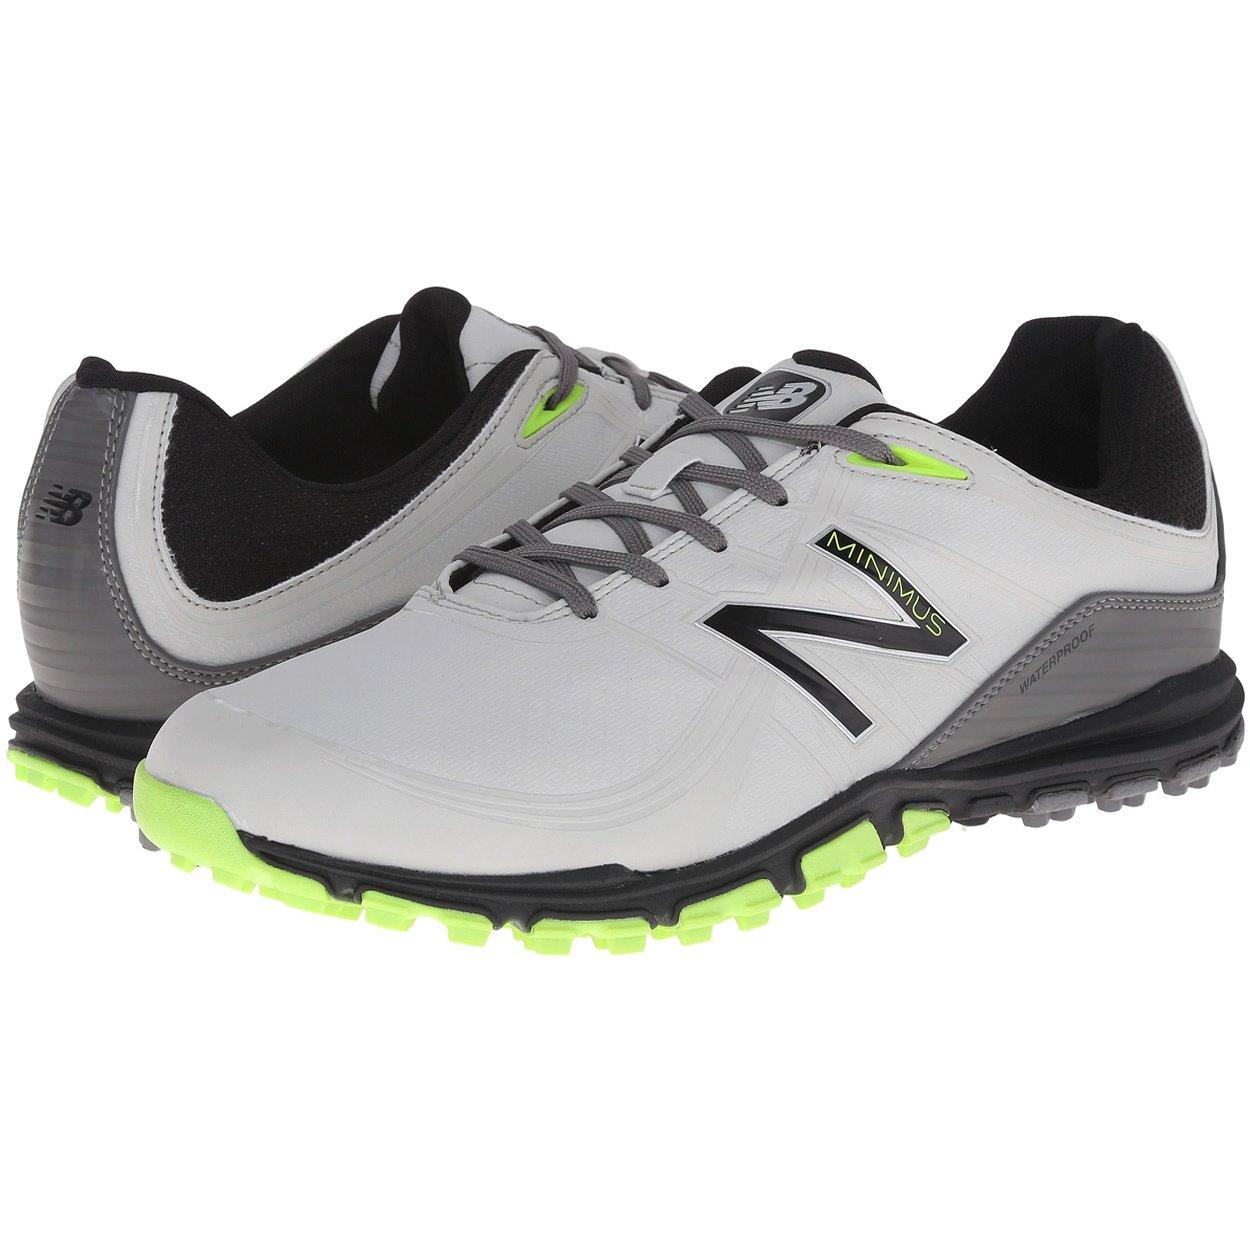 New Balance Men's Minimus Golf Shoe, Grey/Green, 11.5 2E US